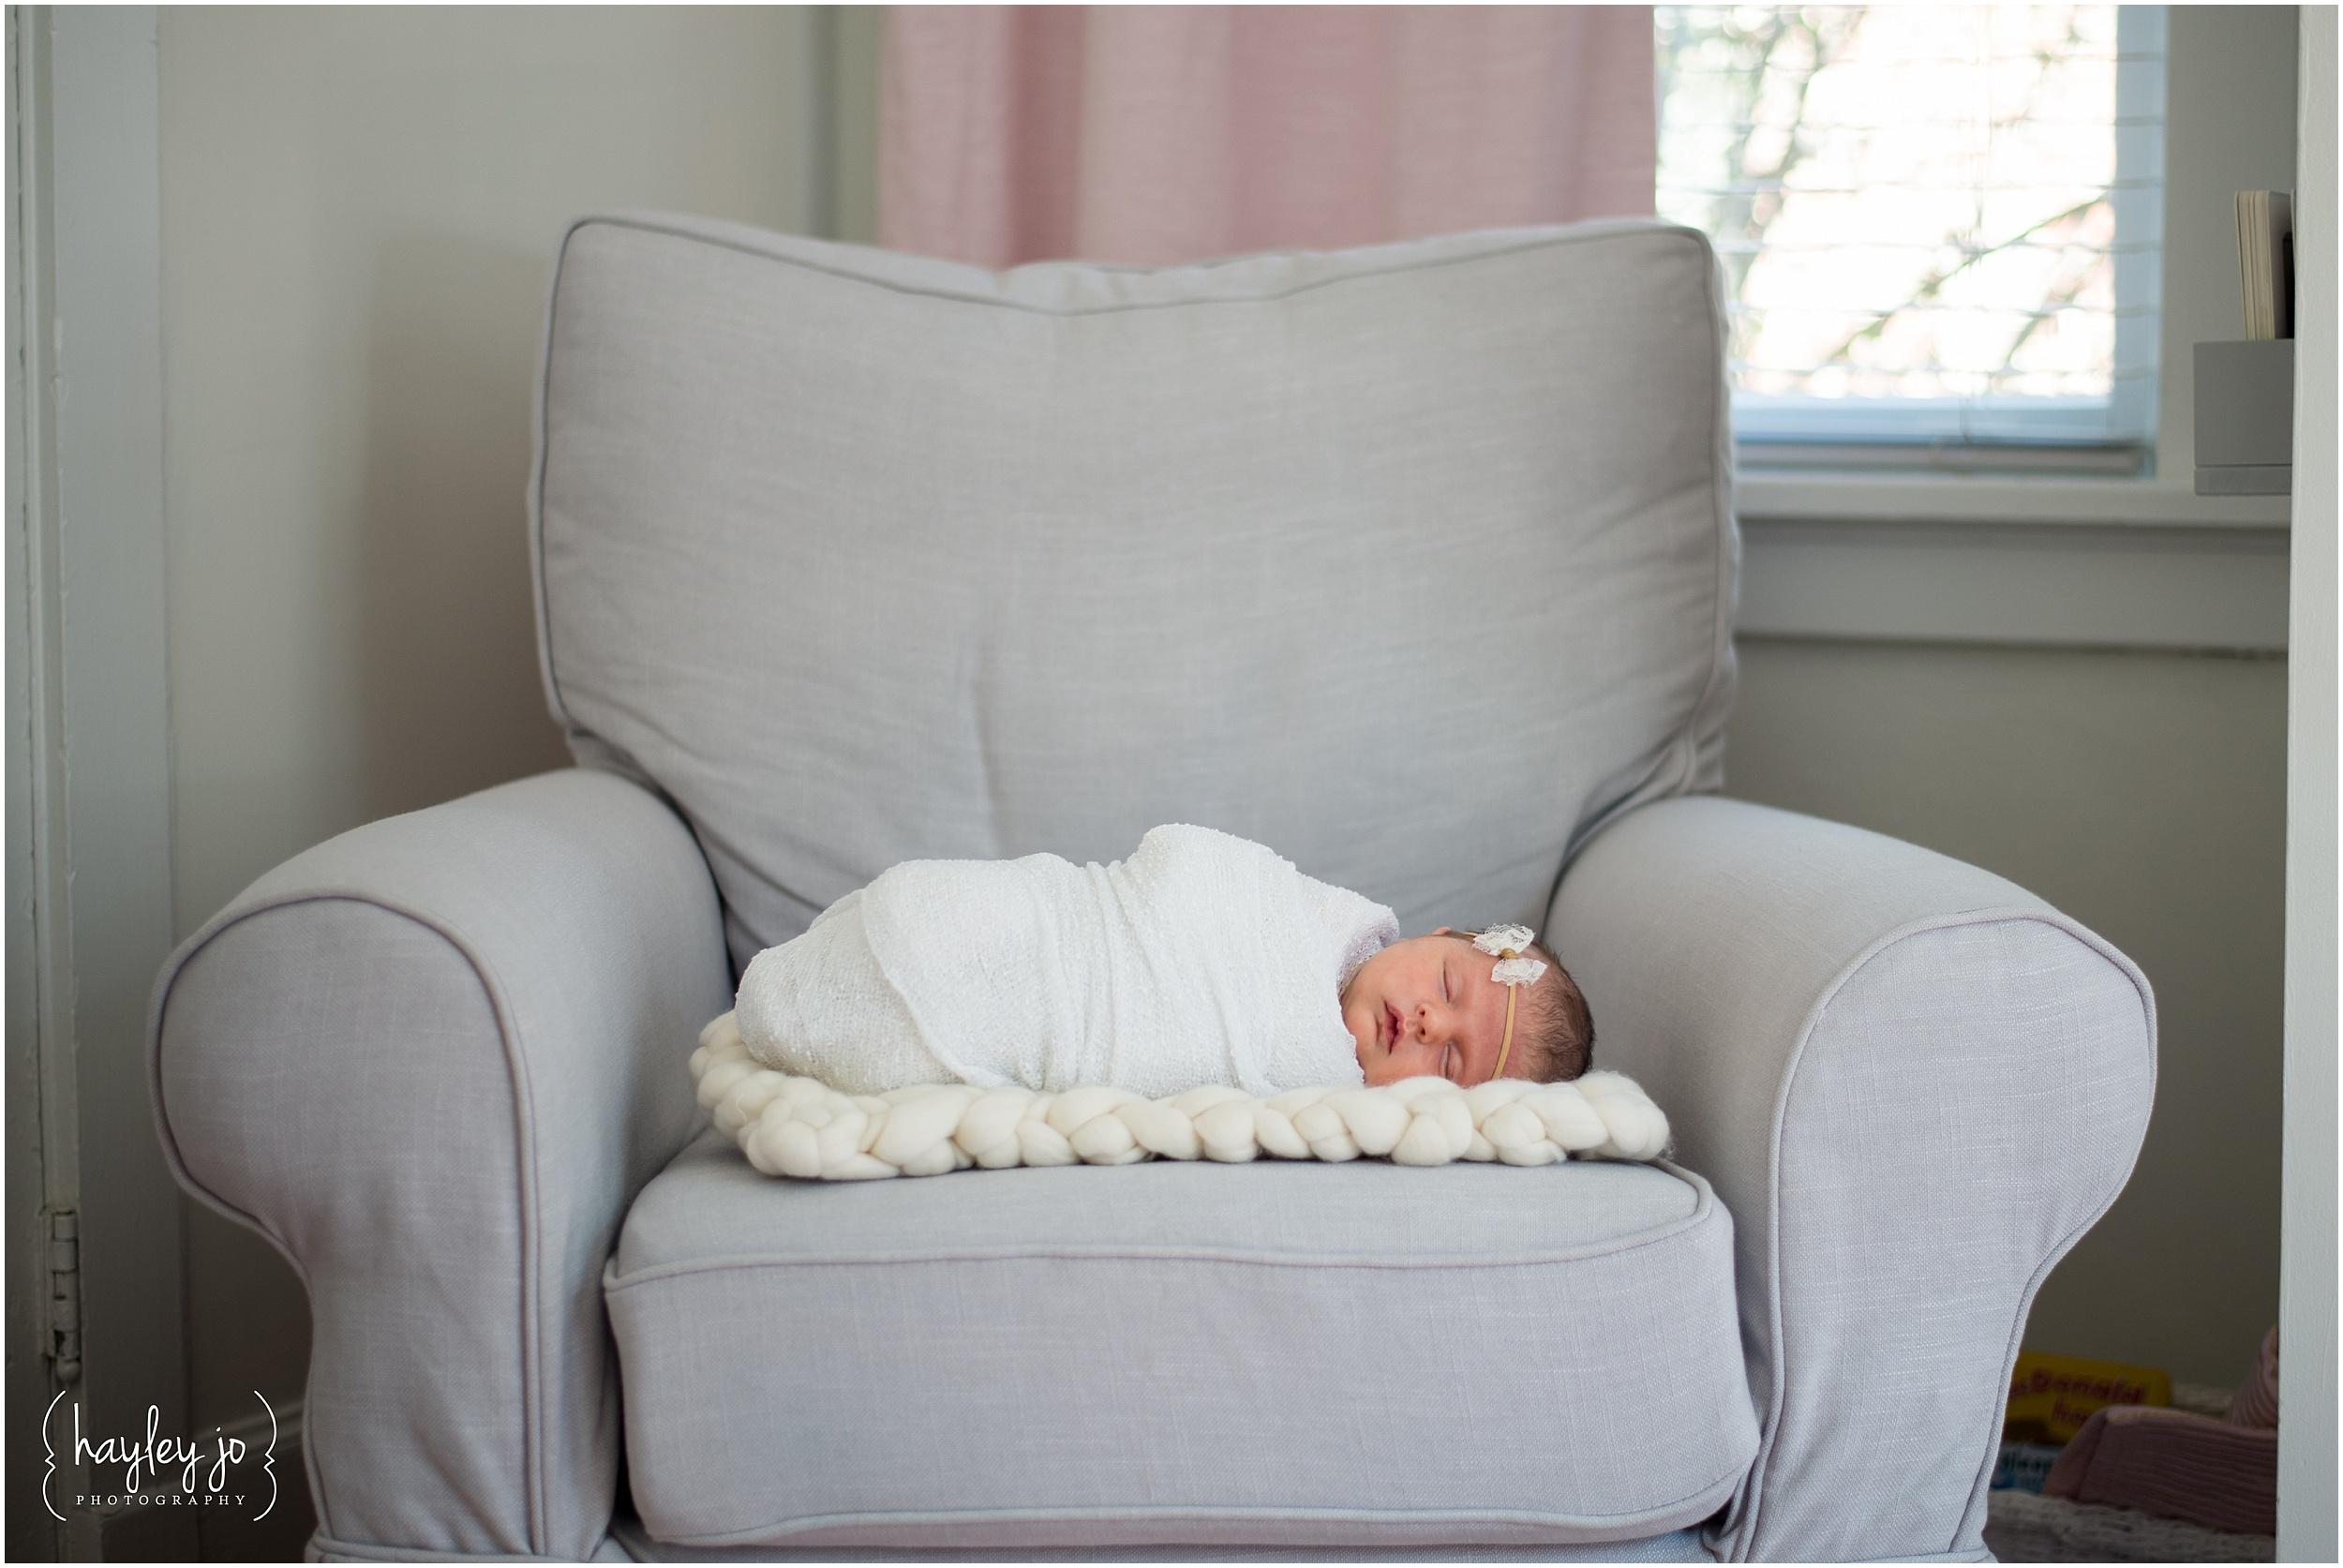 atlanta-newborn-photographer-hayley-jo-photography-atlanta-family-photographer_0184.jpg